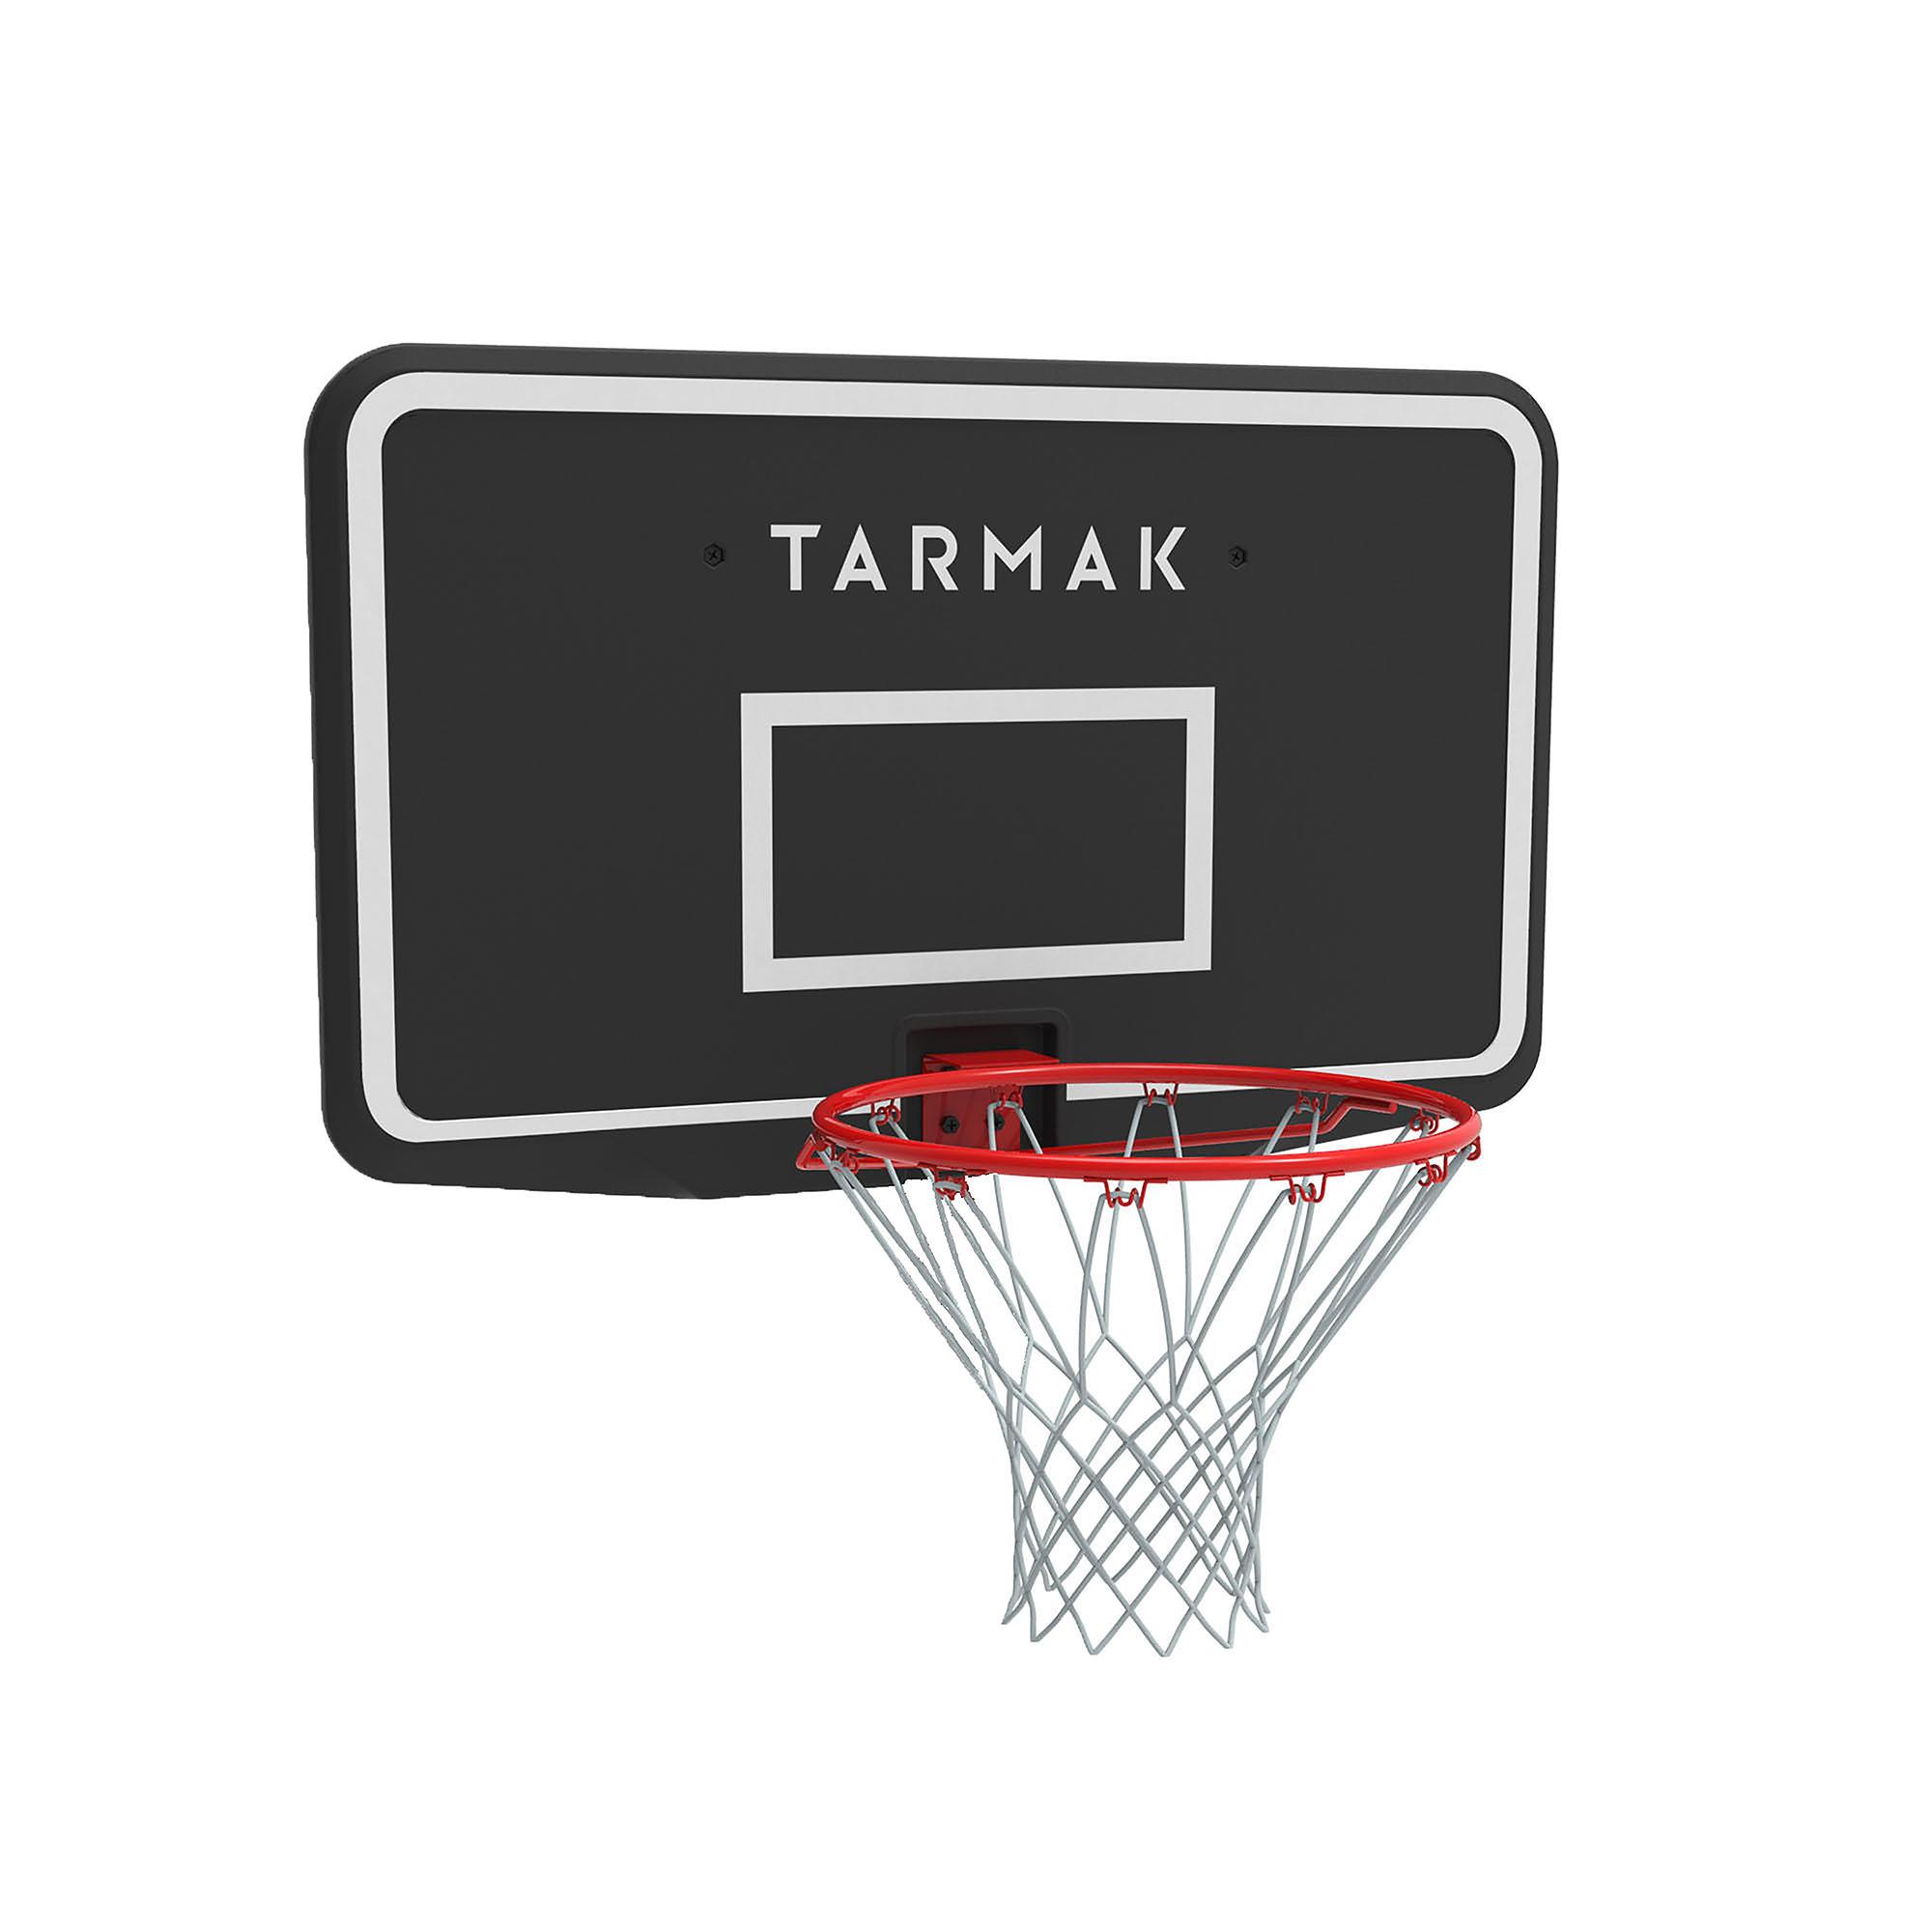 Tablero DE Baloncesto Pared ZY-010